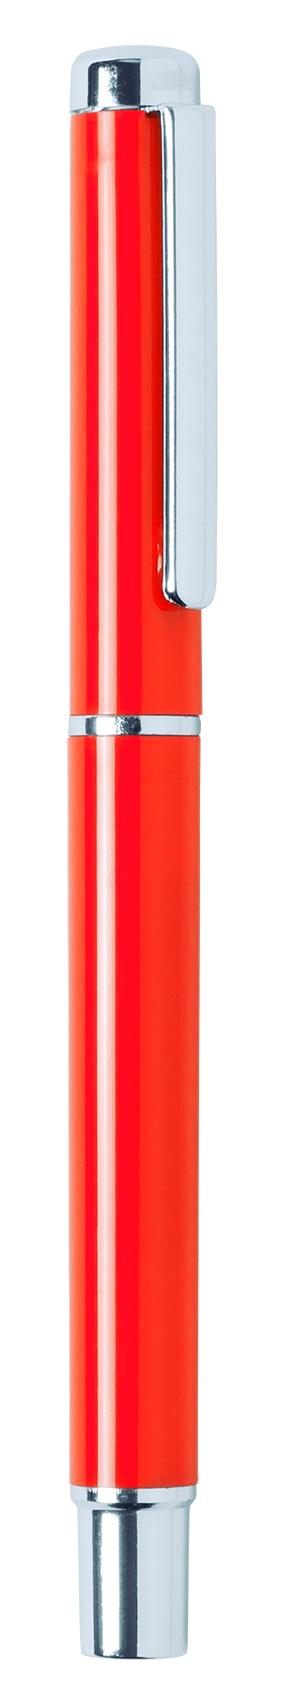 Roller Lexom Color naranja y plateado